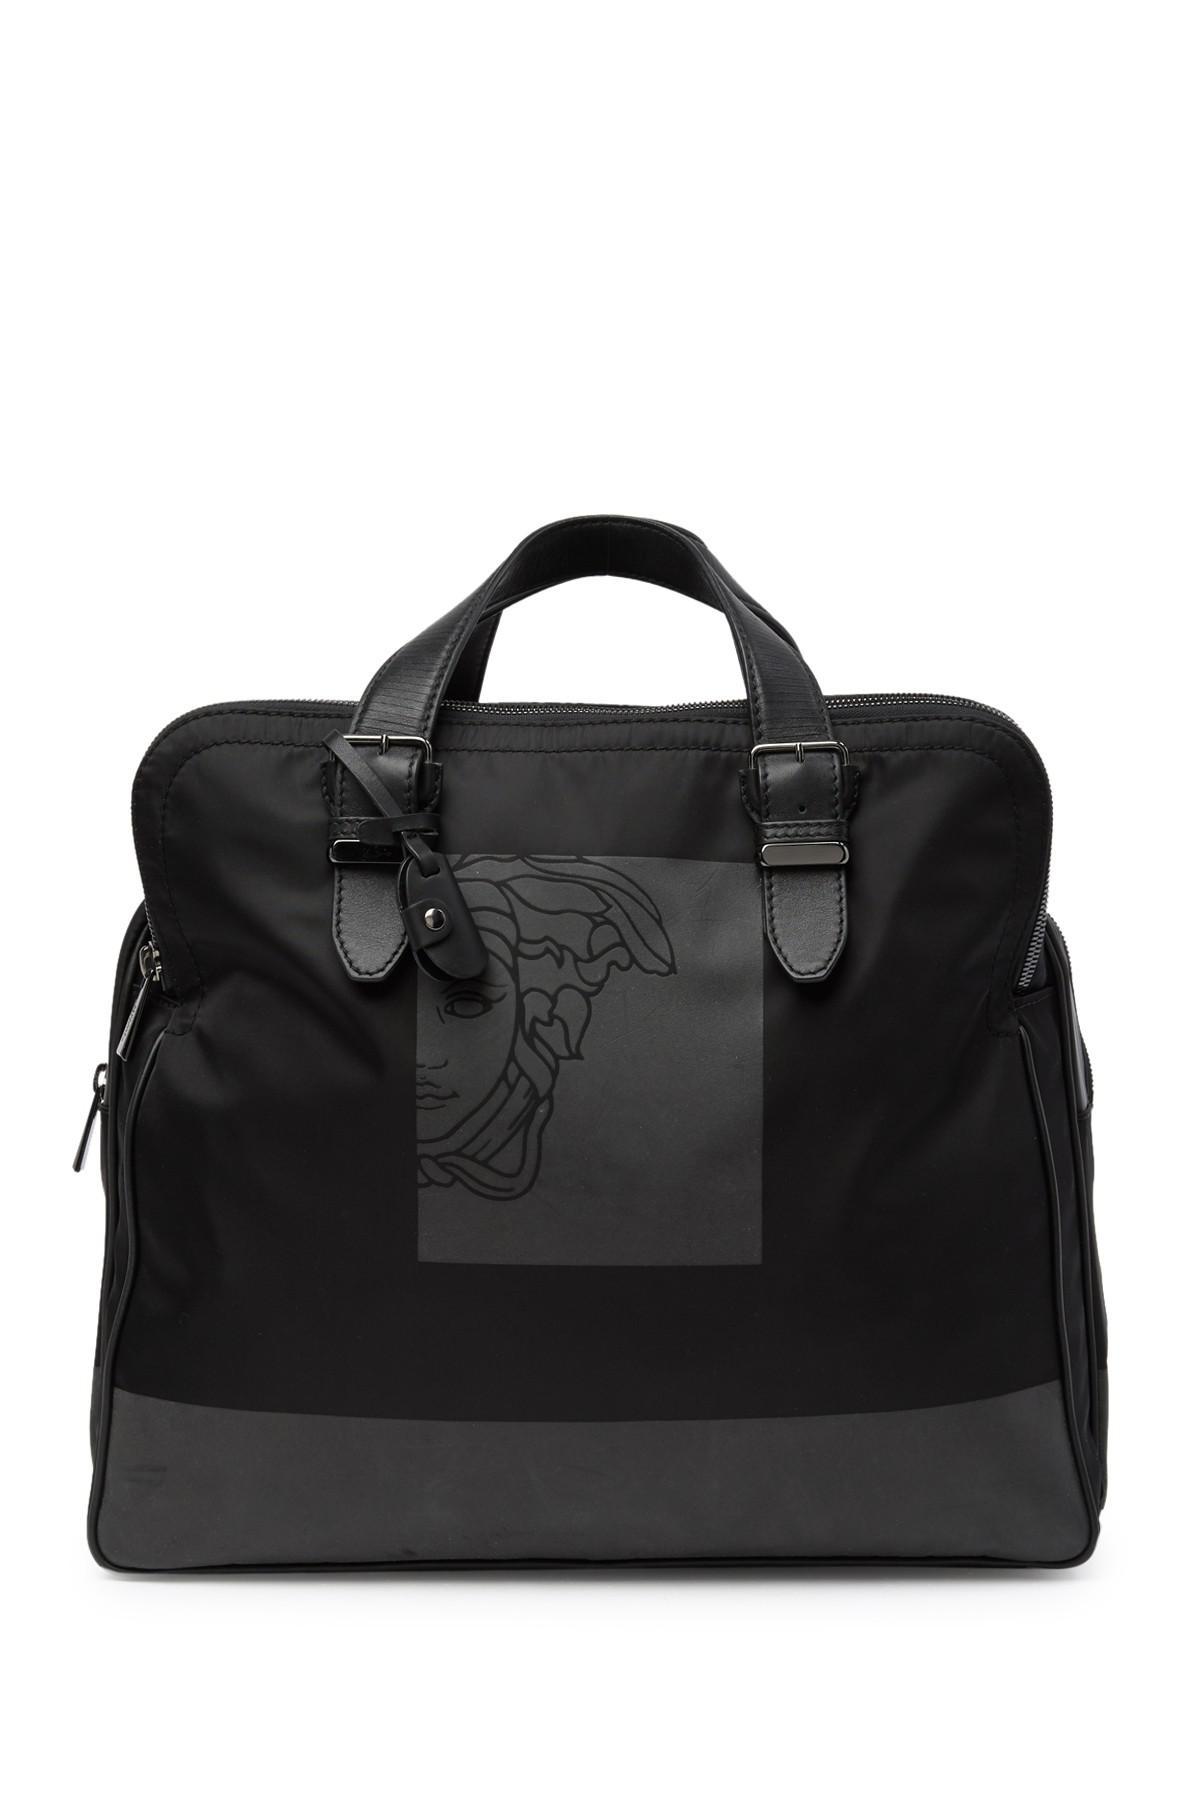 0310f3fdcb Lyst - Versace Medusa Nylon   Leather Weekend Bag in Black for Men